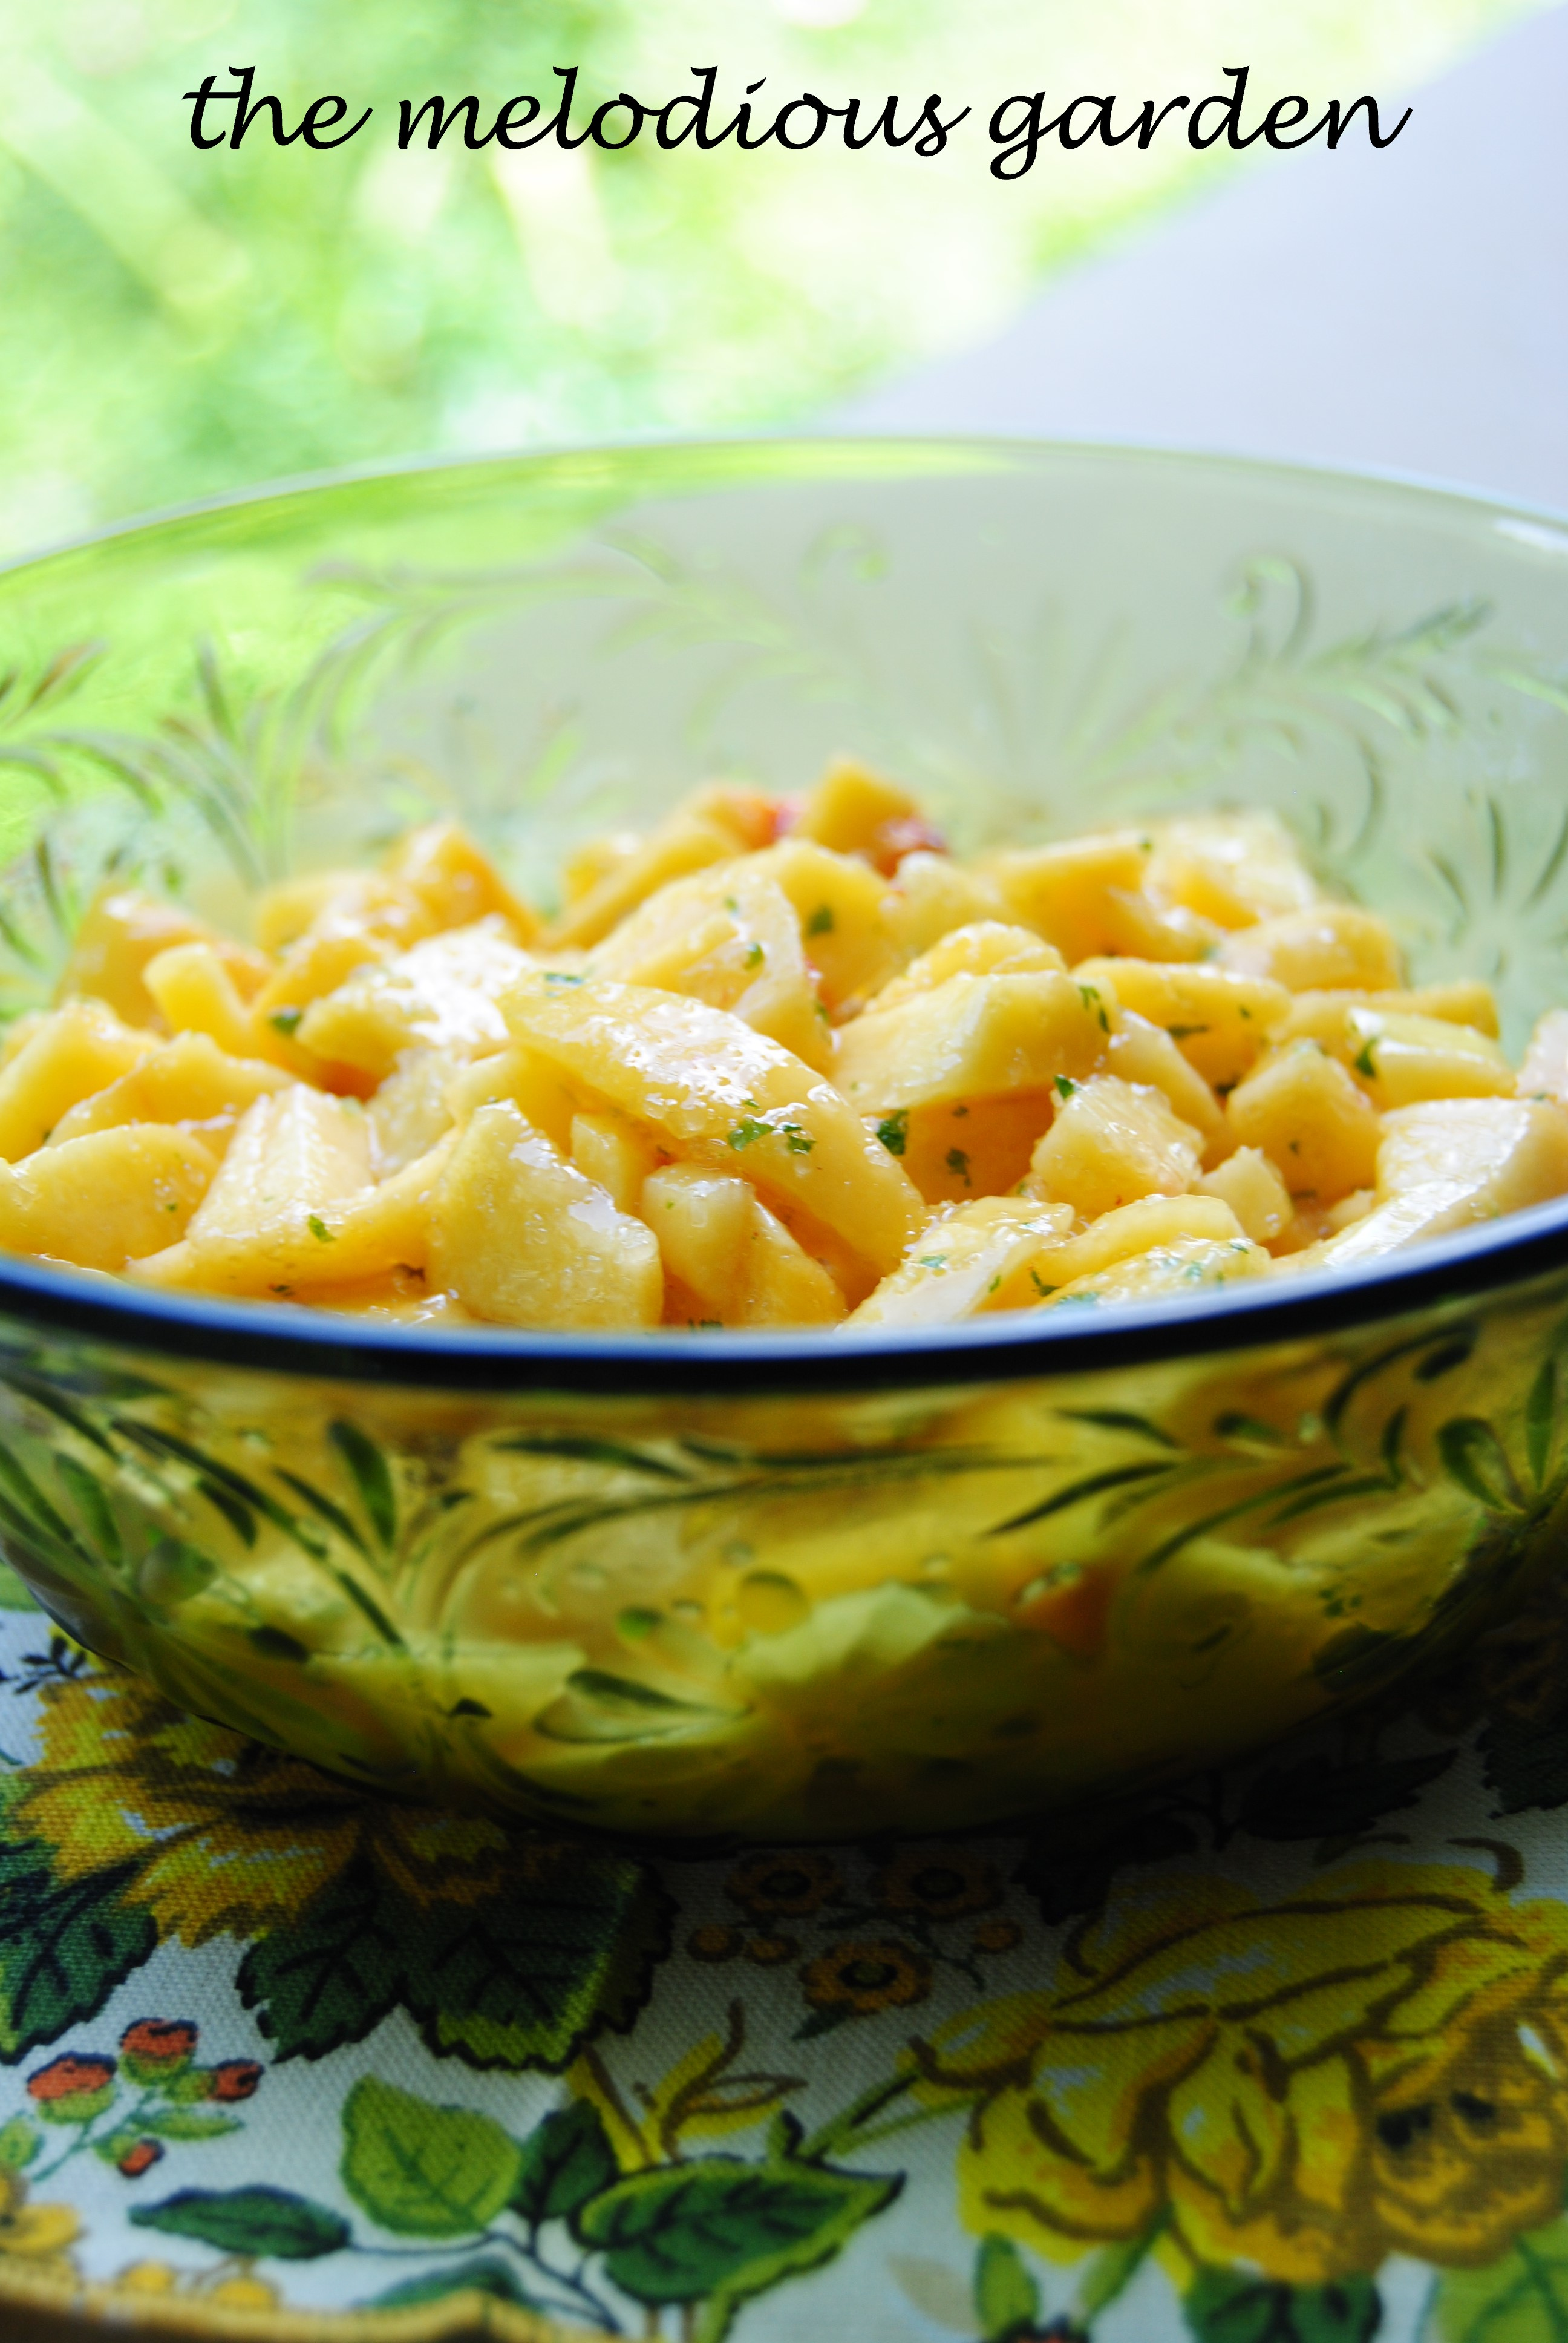 peaches with lemon verbena